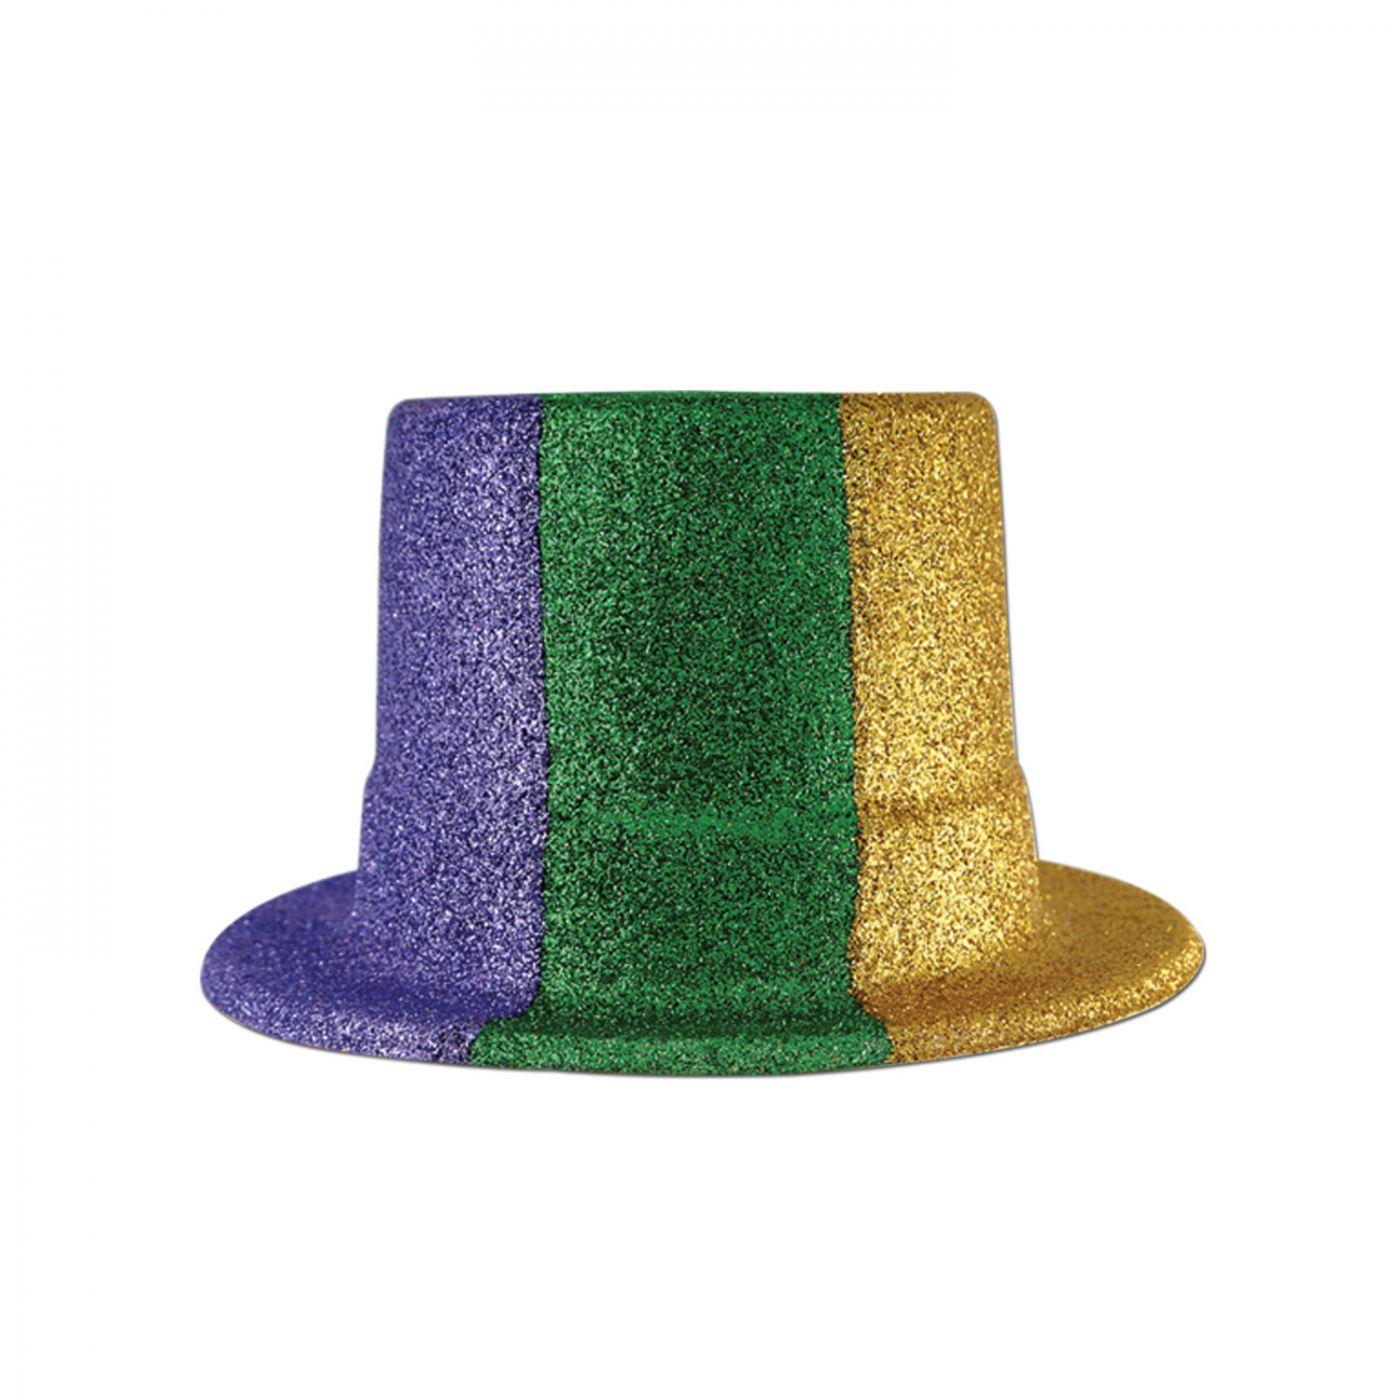 Glittered Mardi Gras Top Hat (24) image